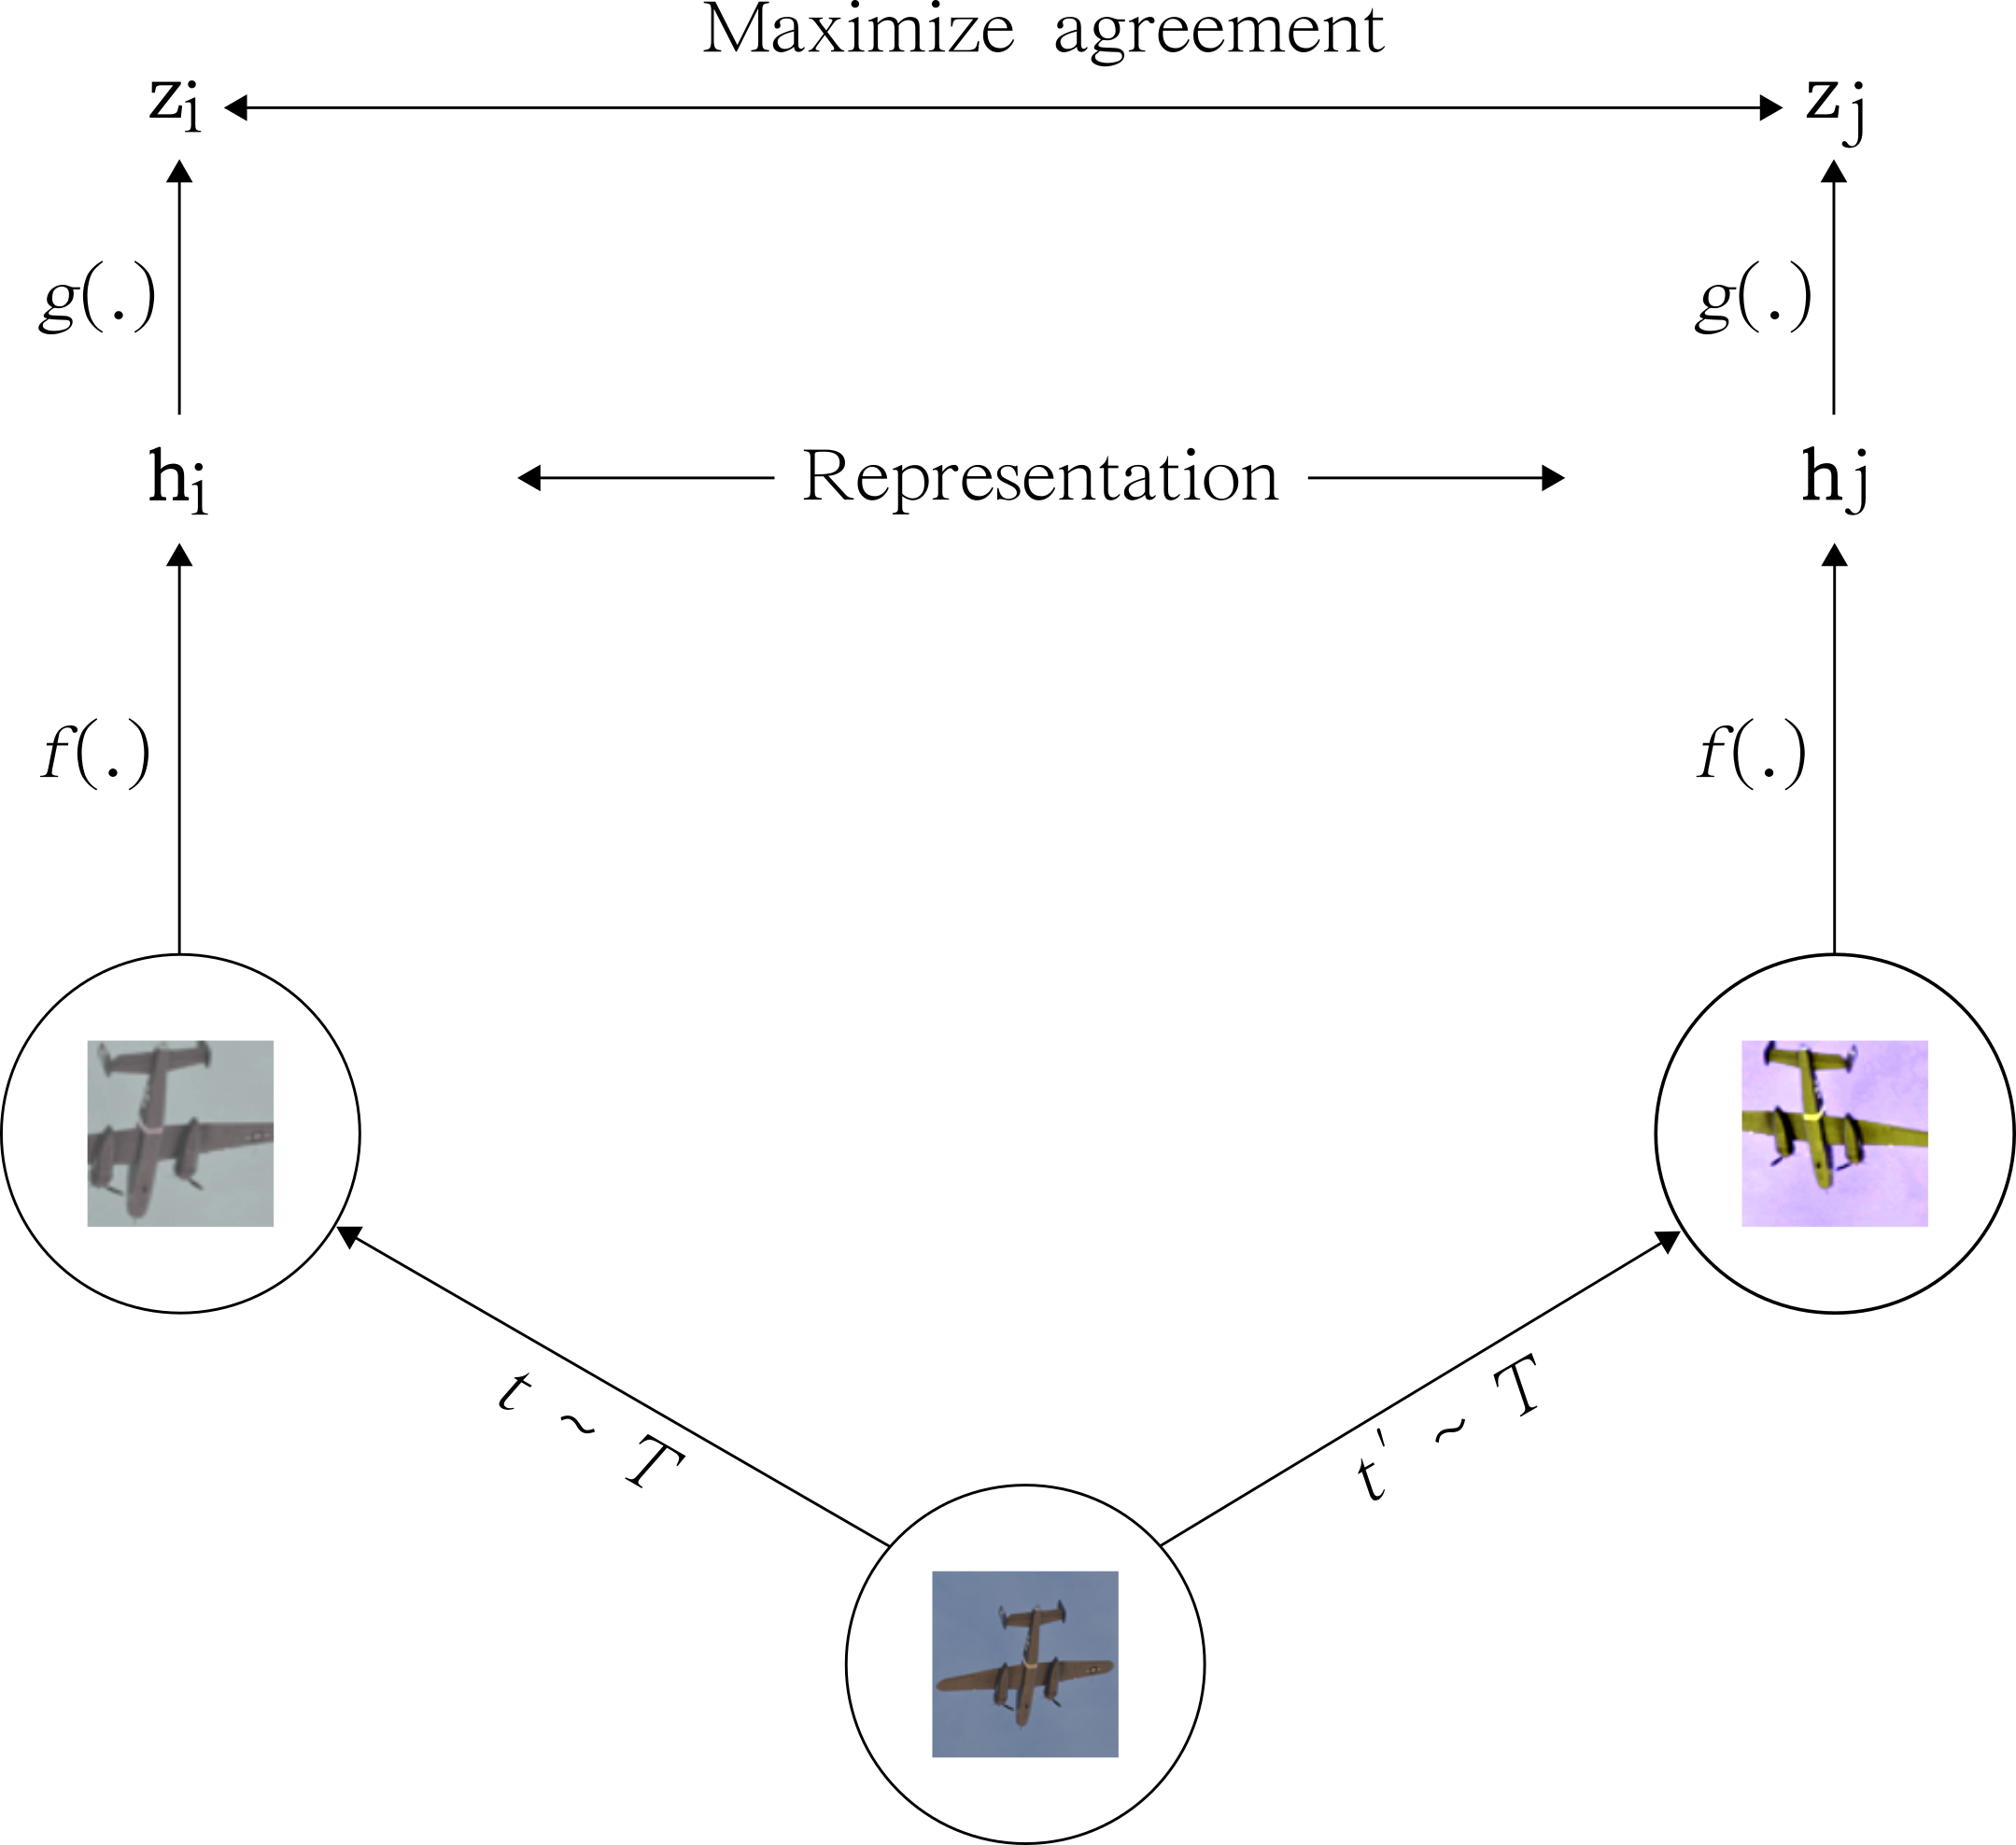 Negative pairs